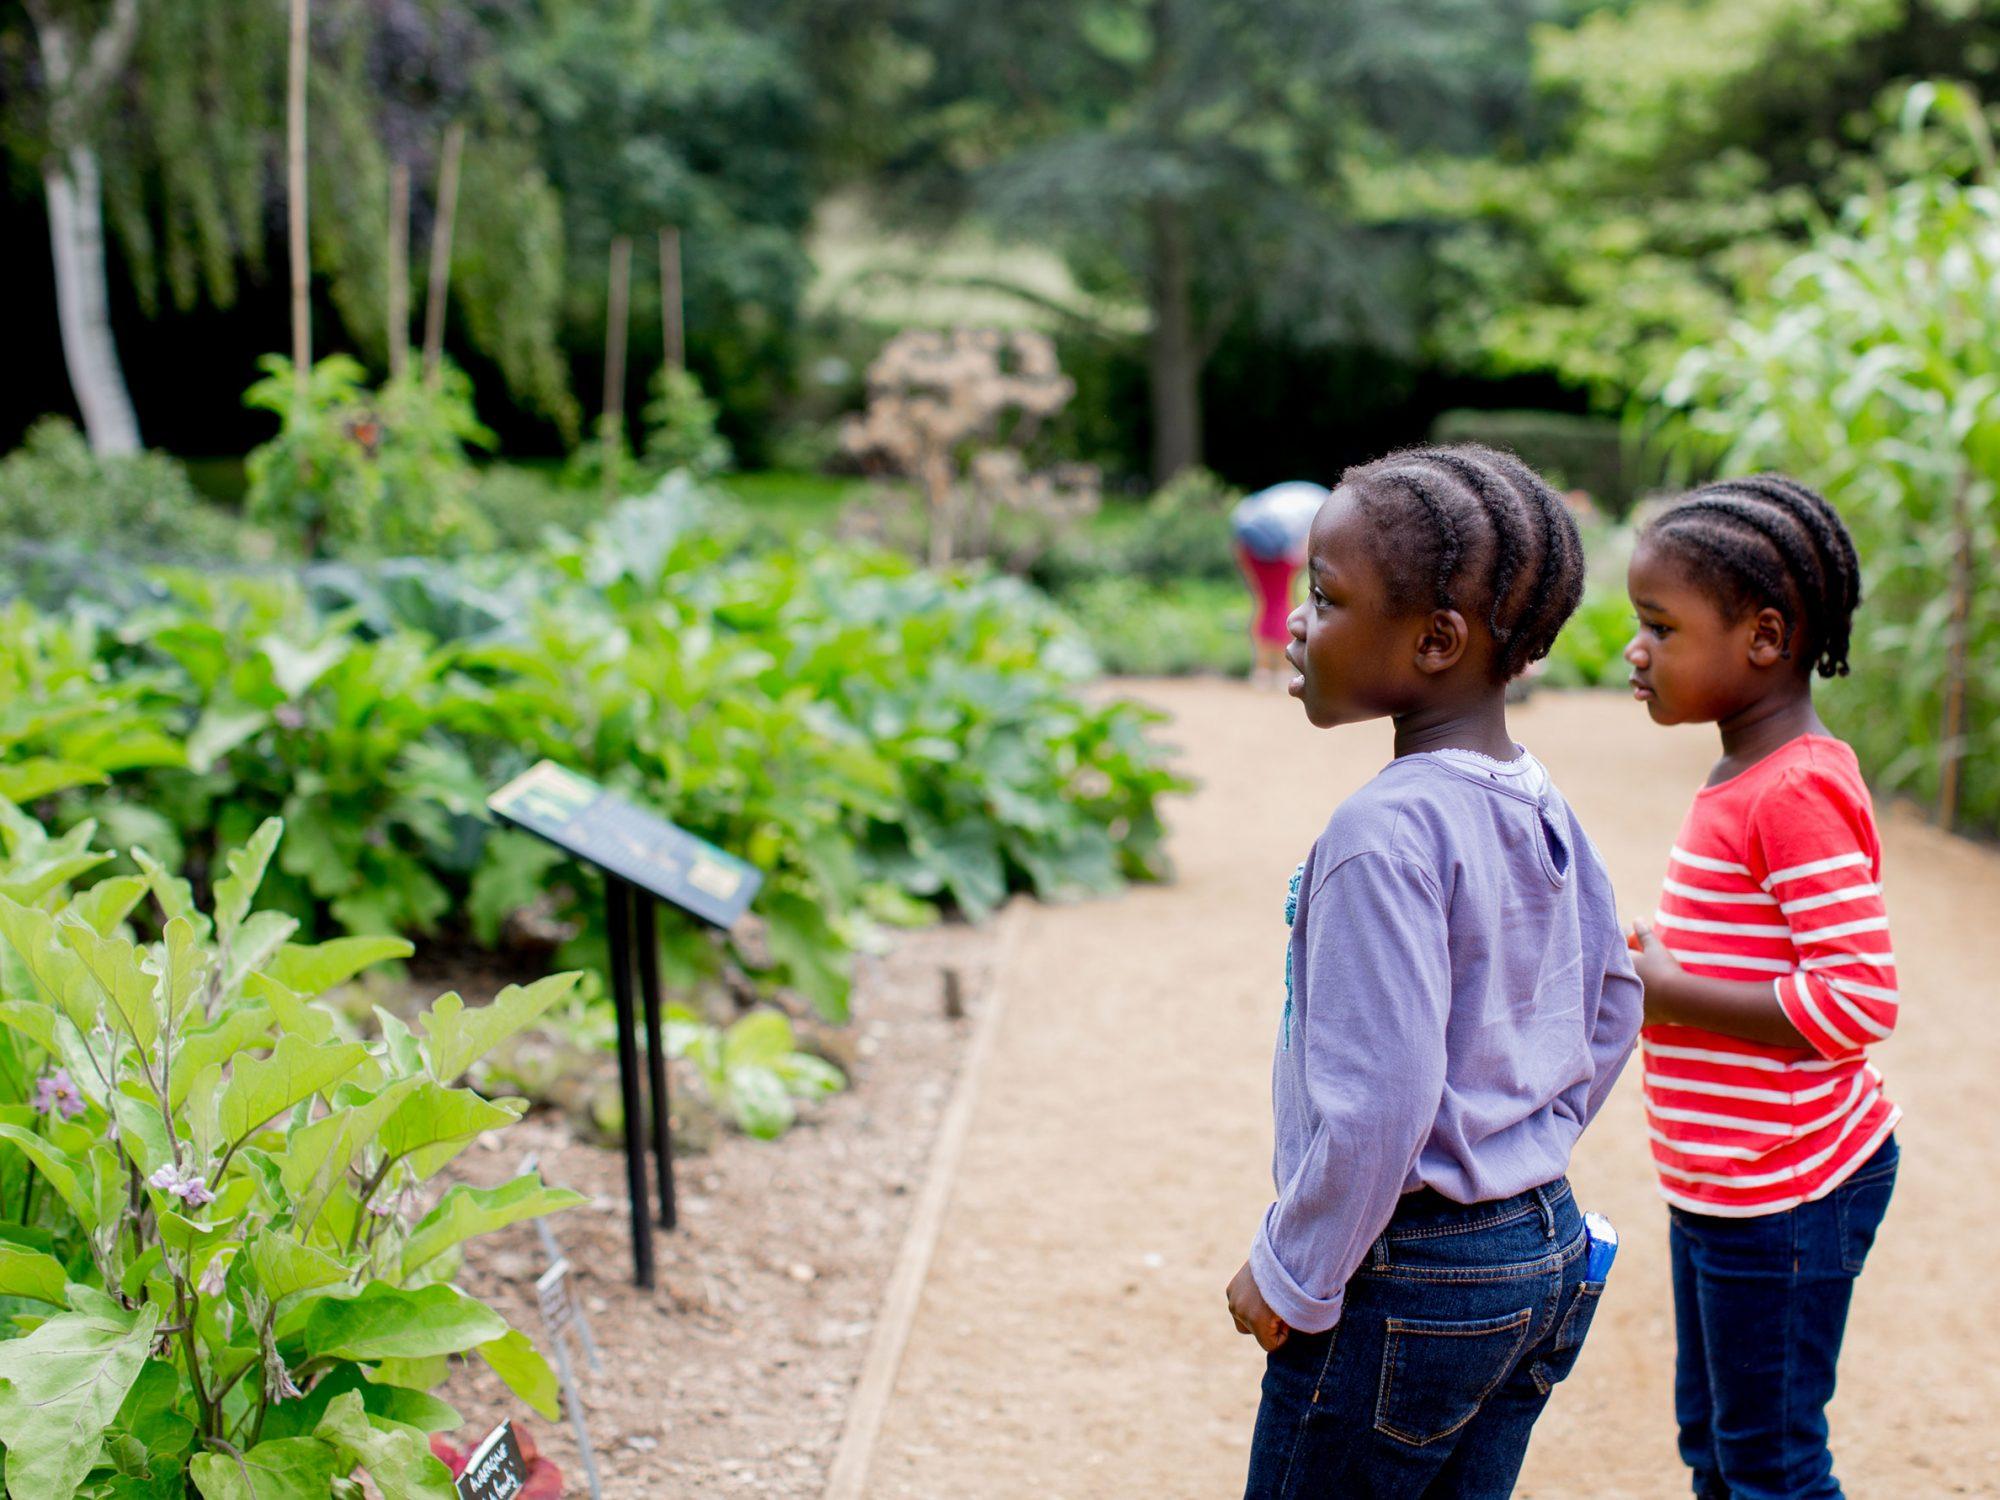 Children exploring the Gardens